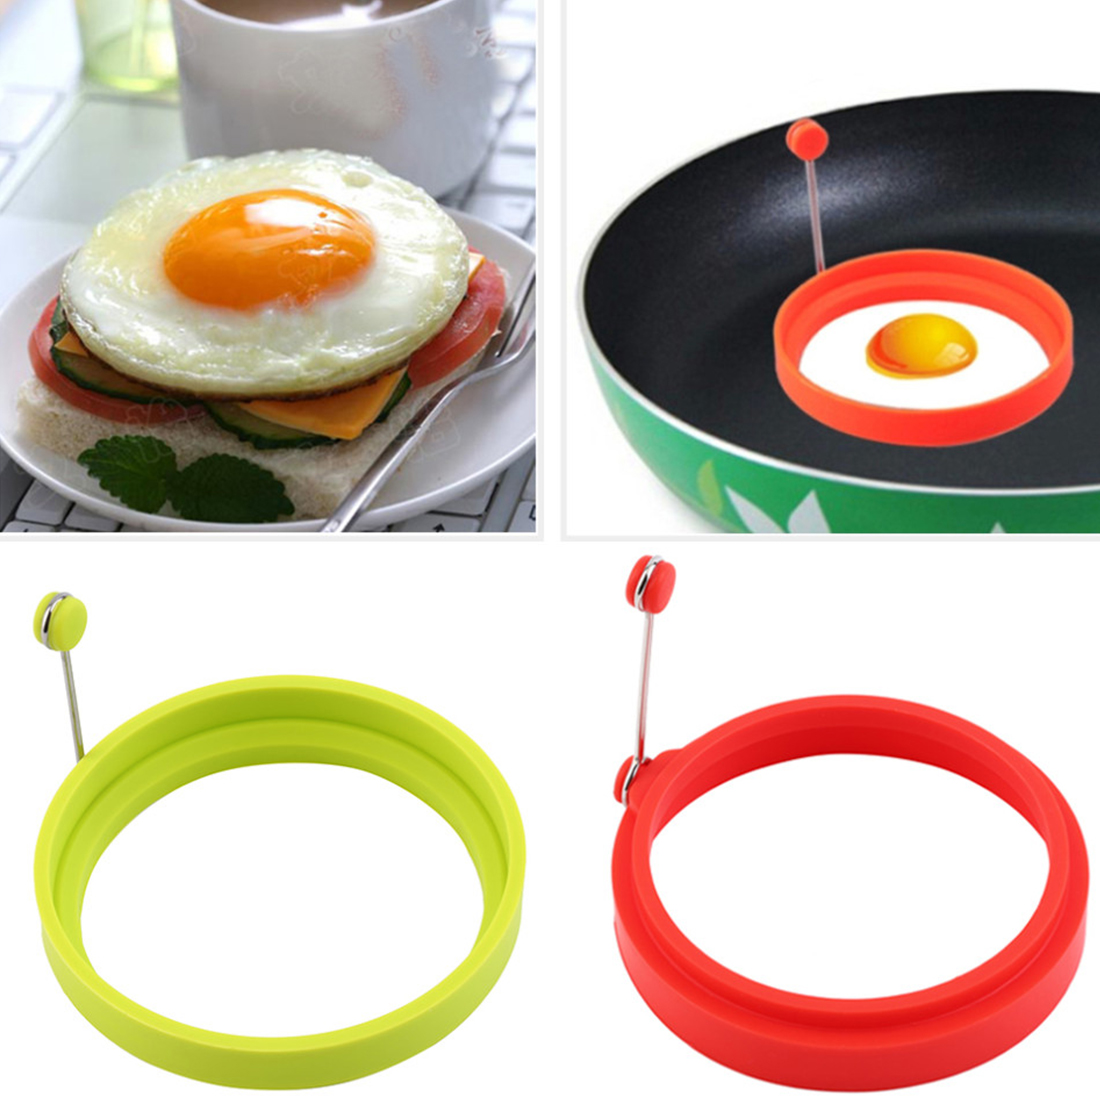 Omelette clipart hot frying pan For Eggs Get Round Omelette